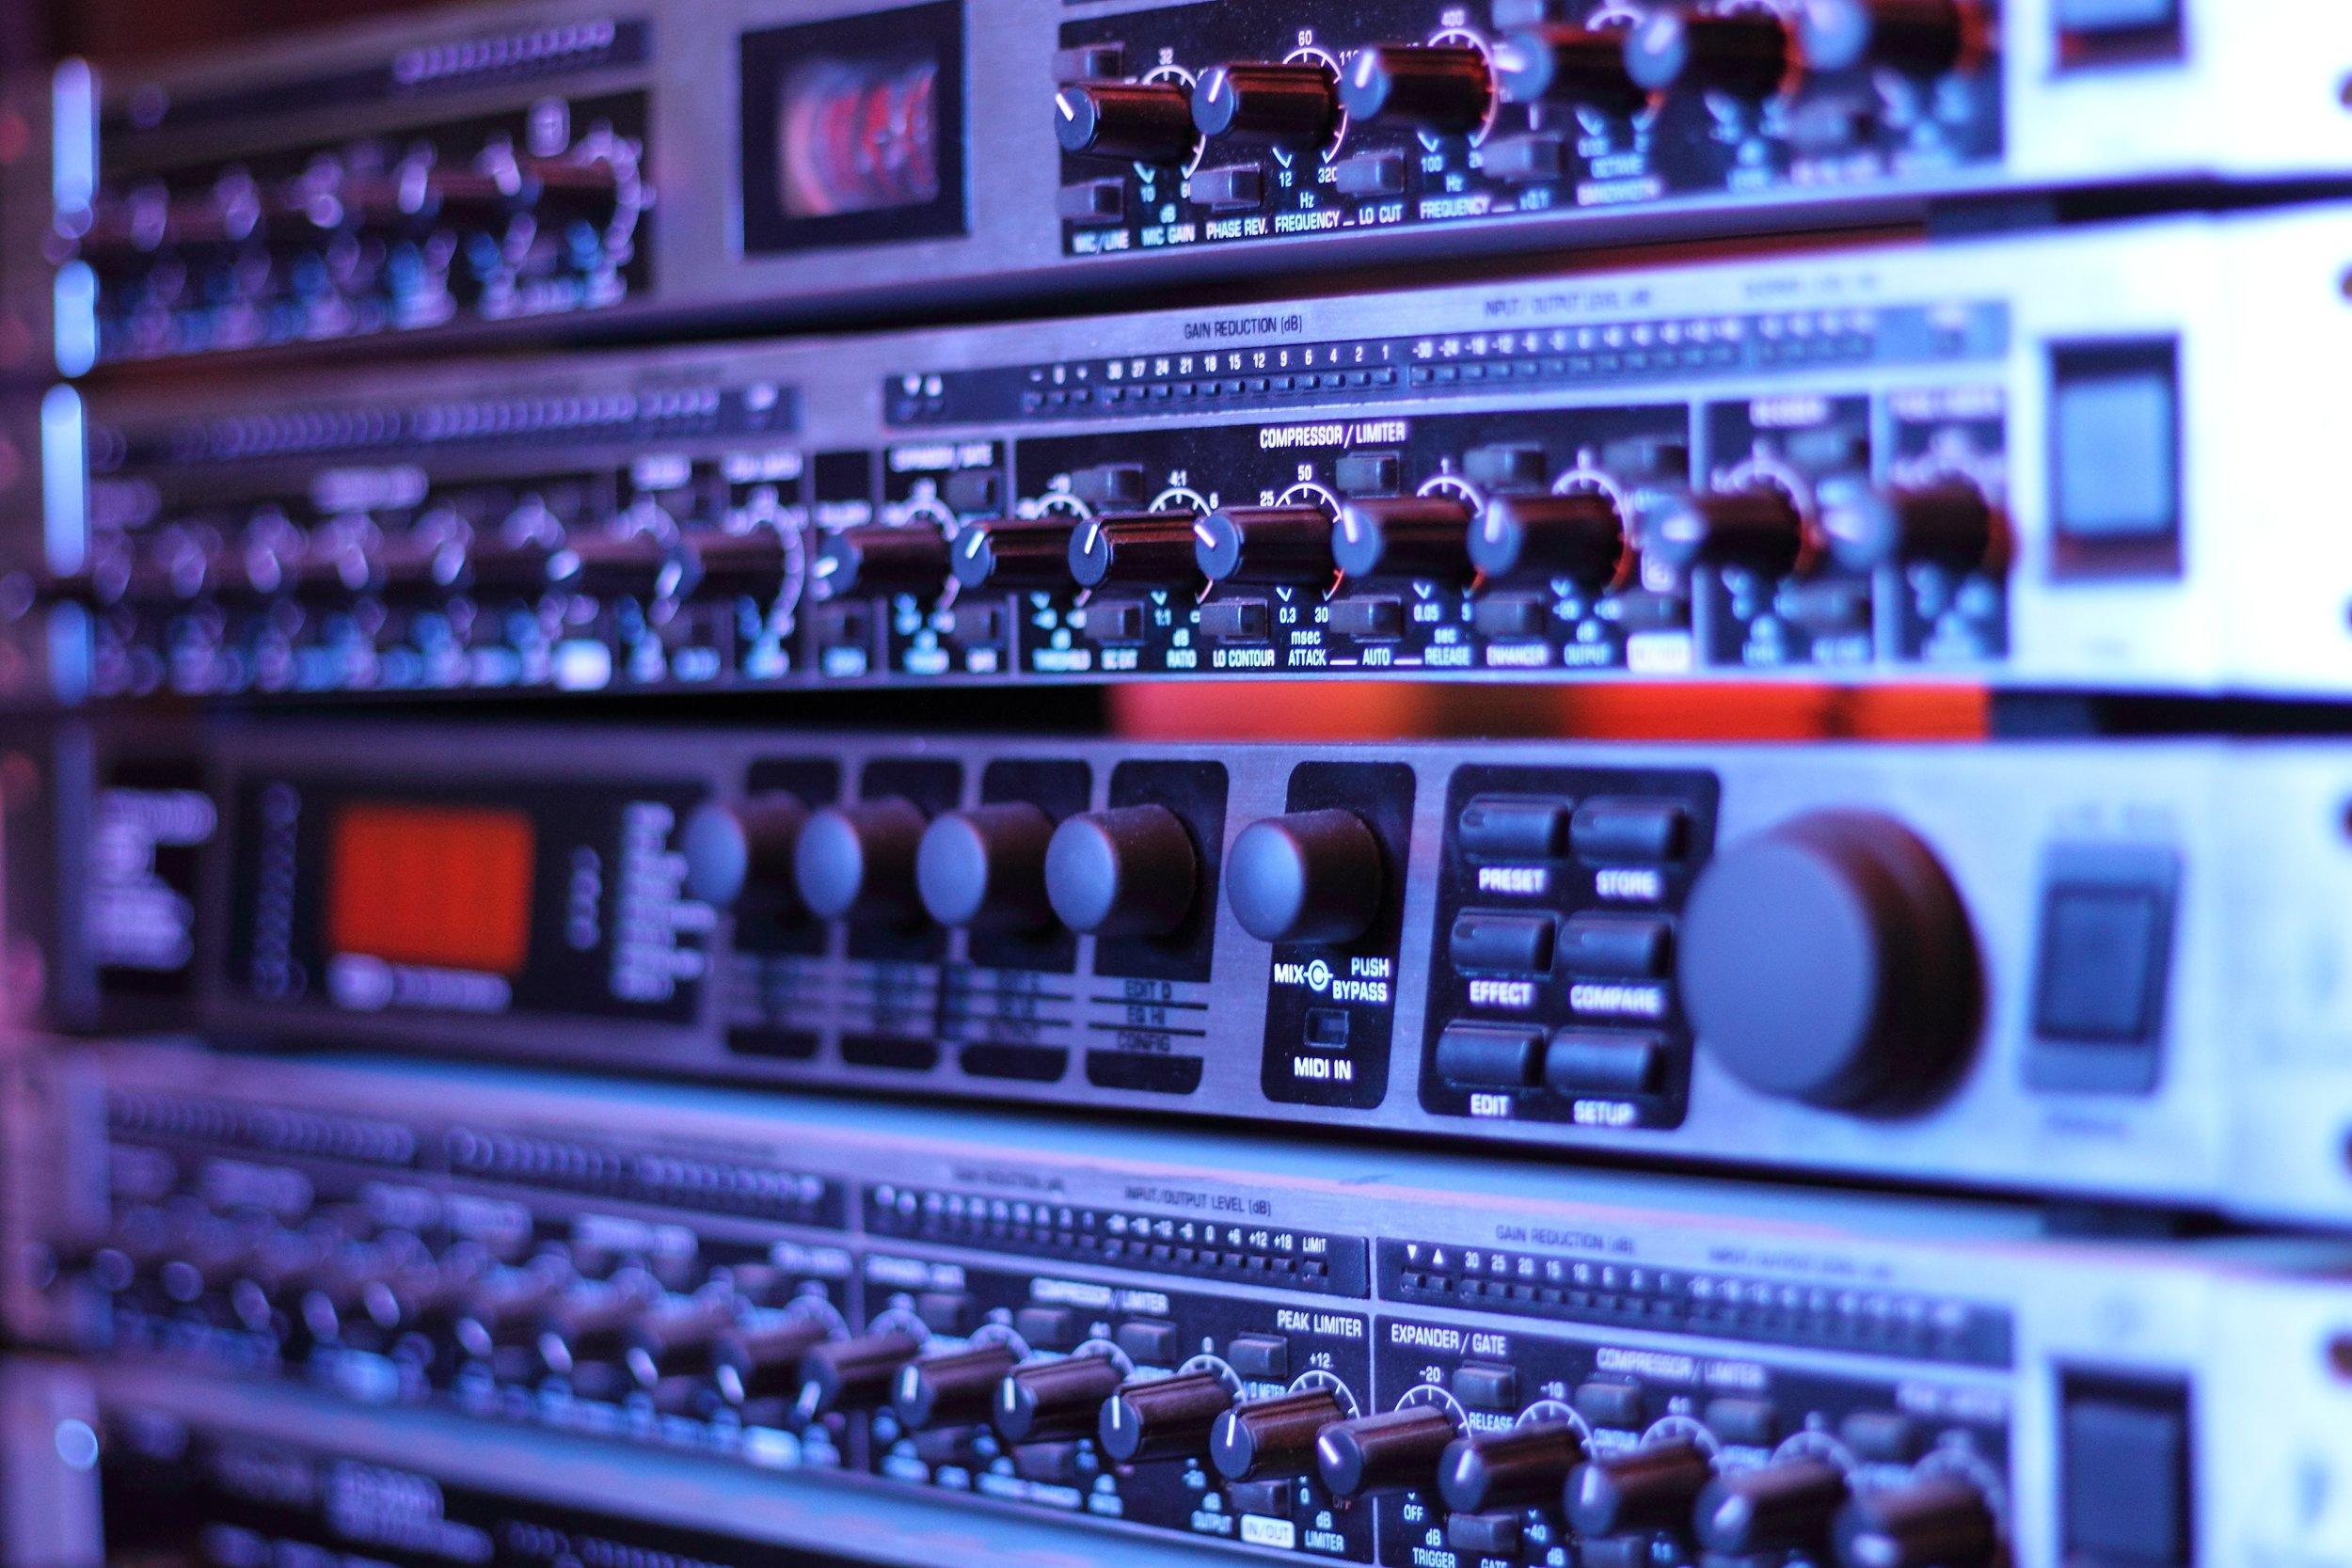 troubleshooting in the studio.jpg